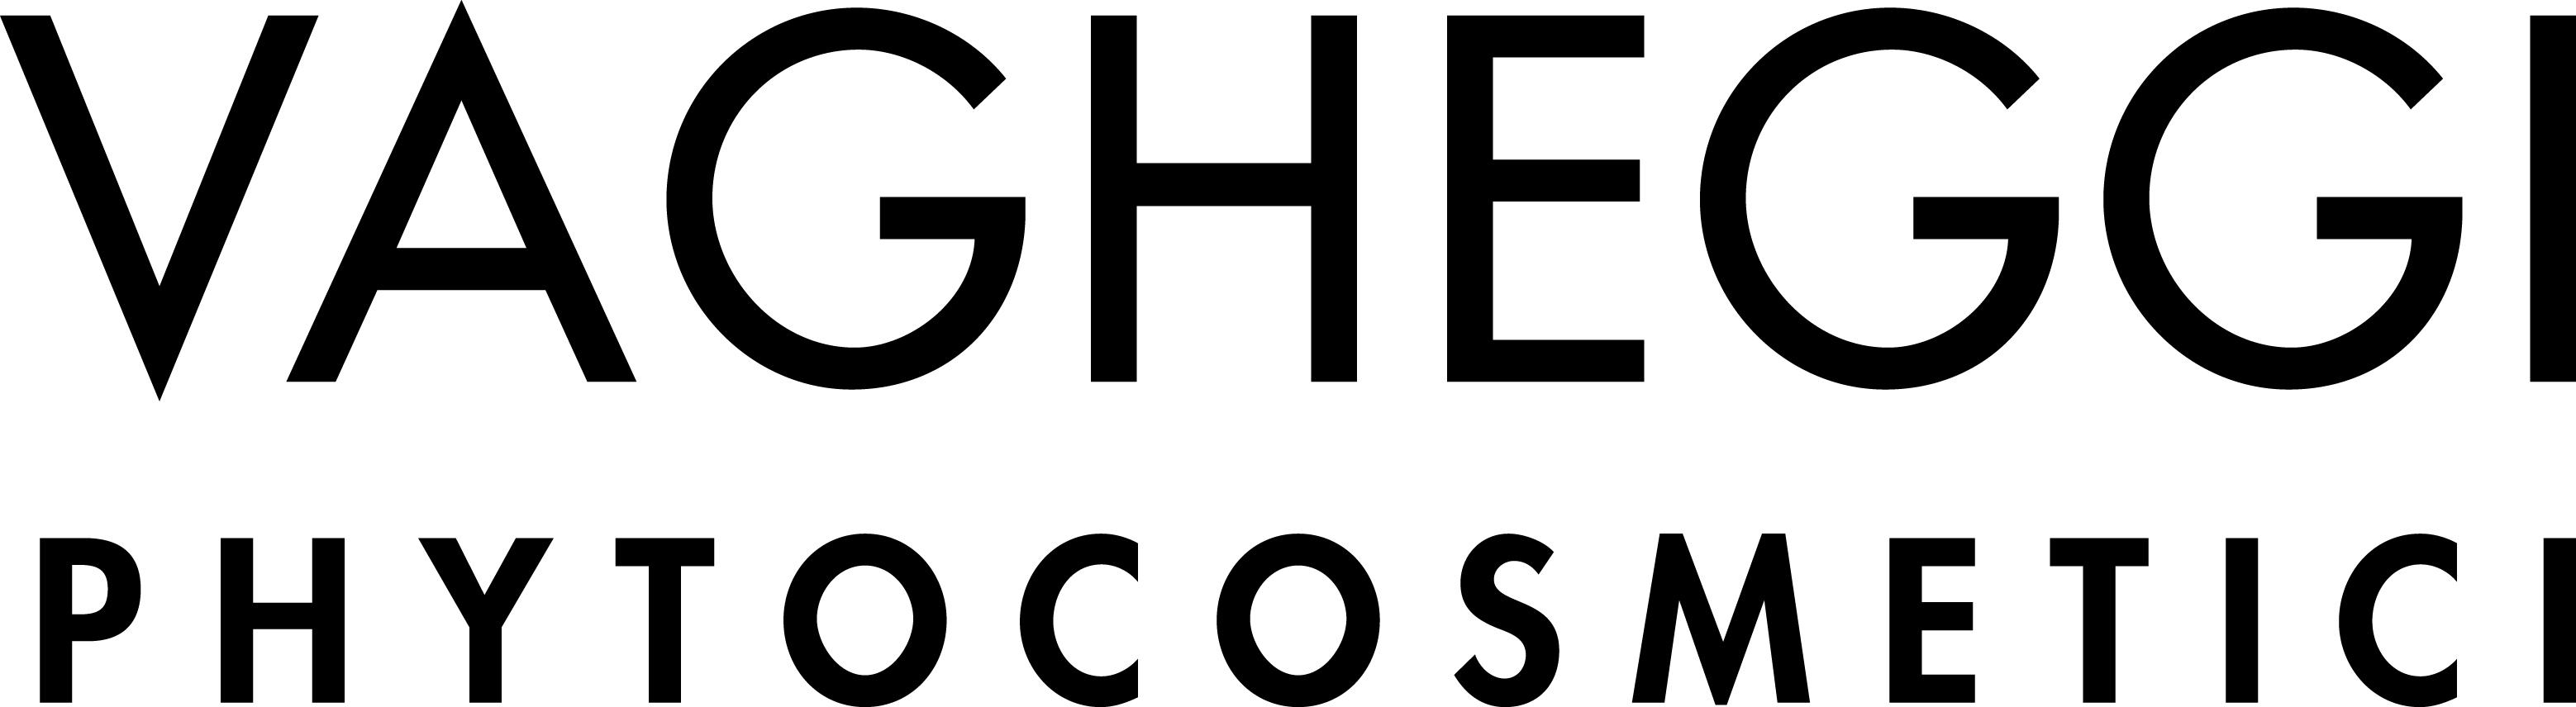 vagheggi_phytocosmetici-black.jpg